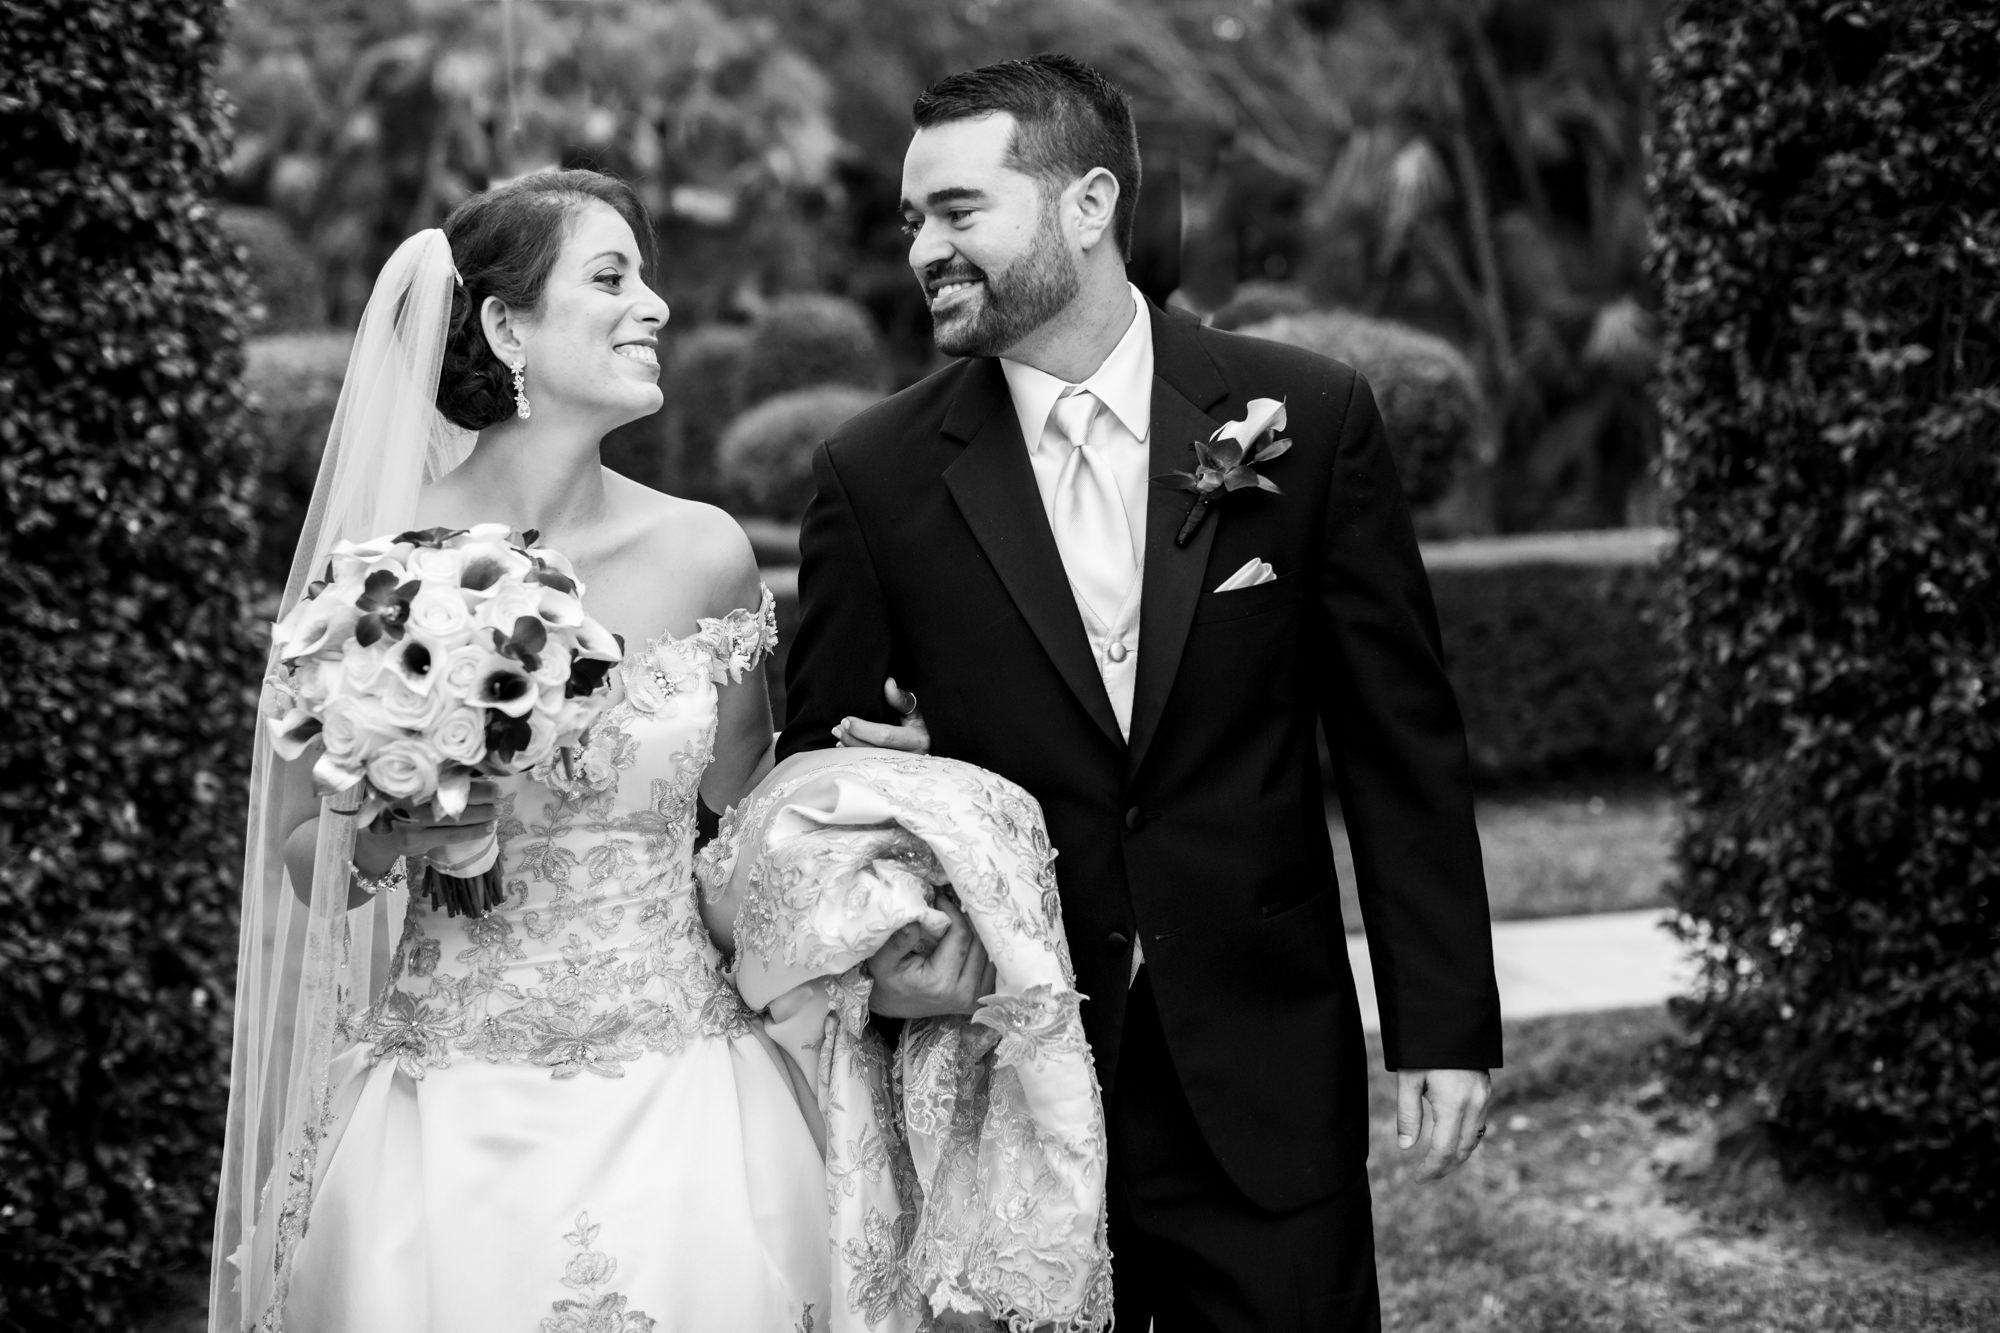 Benvenuto_Wedding_catholic_Florida_Bride-Groom-86.jpg